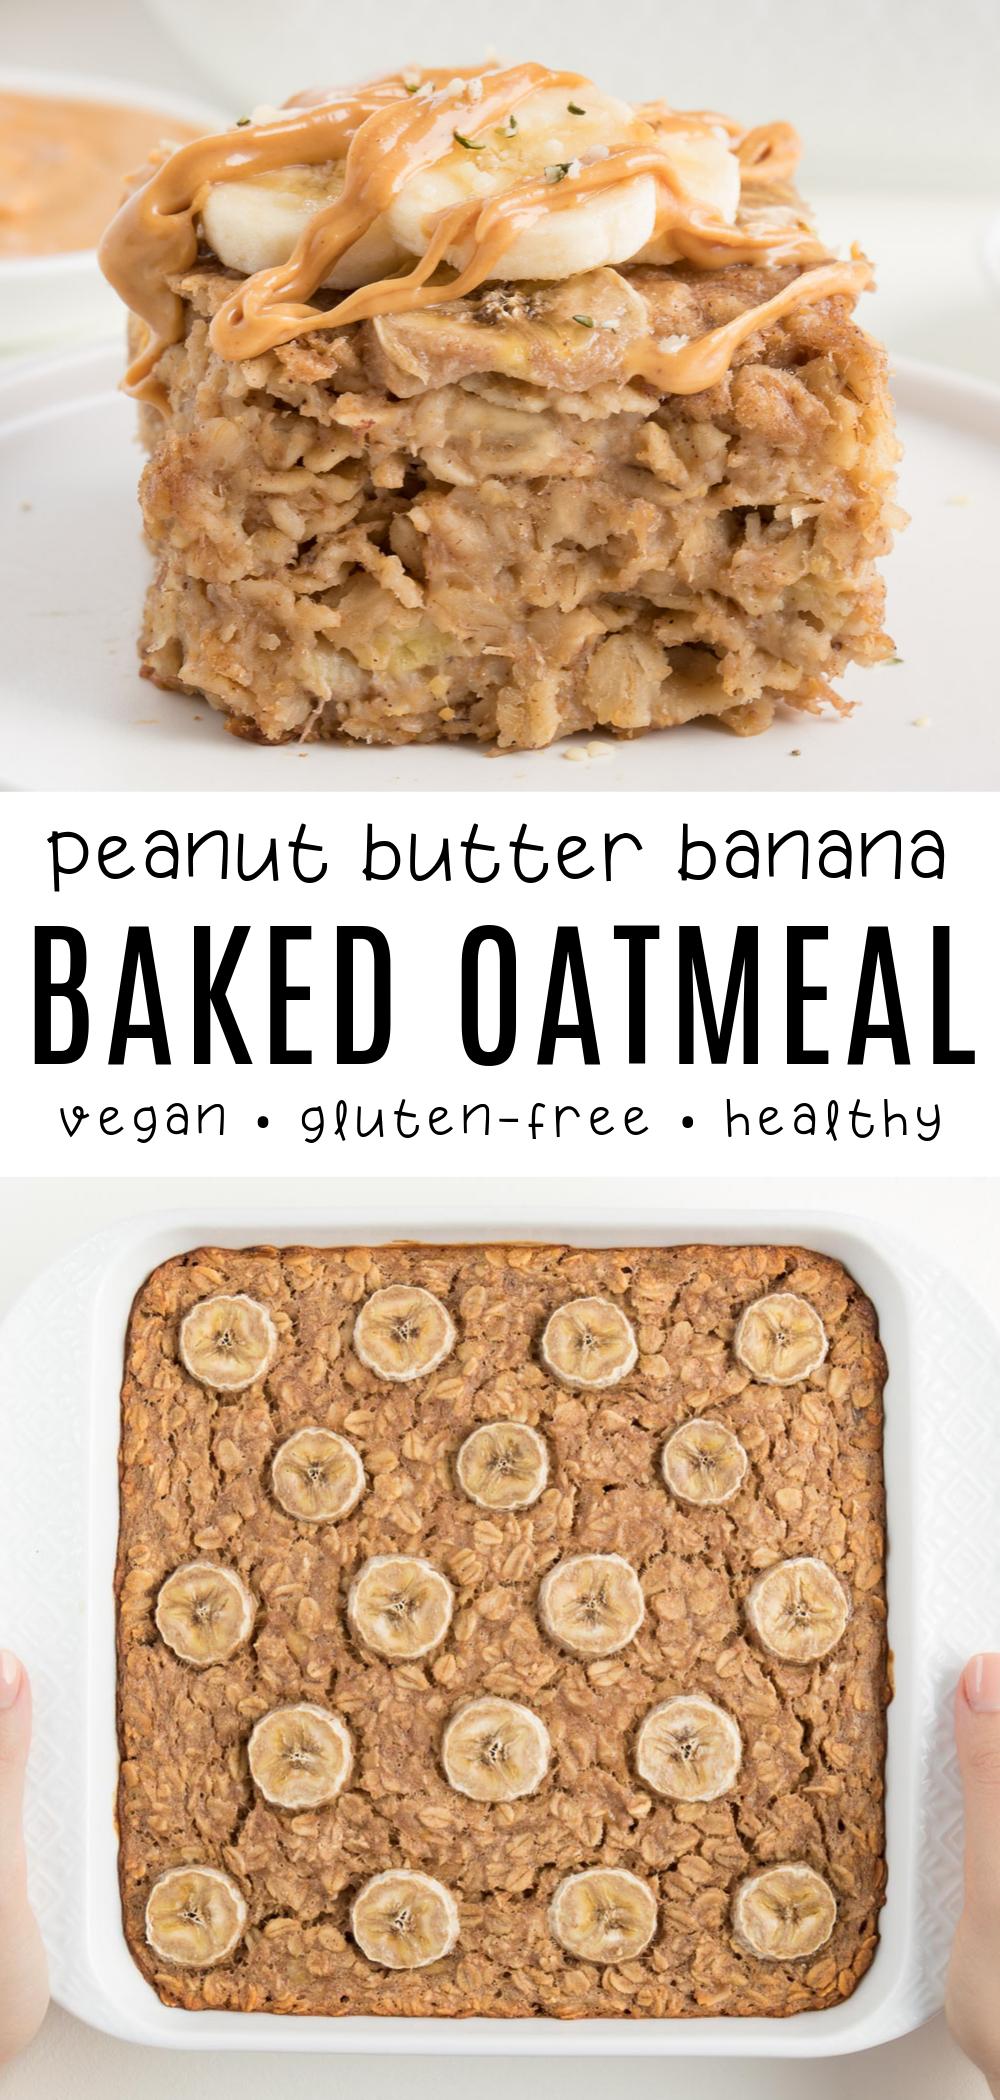 Peanut Butter Banana Baked Oatmeal Recipe Banana Baked Oatmeal Vegan Breakfast Easy Baked Oatmeal